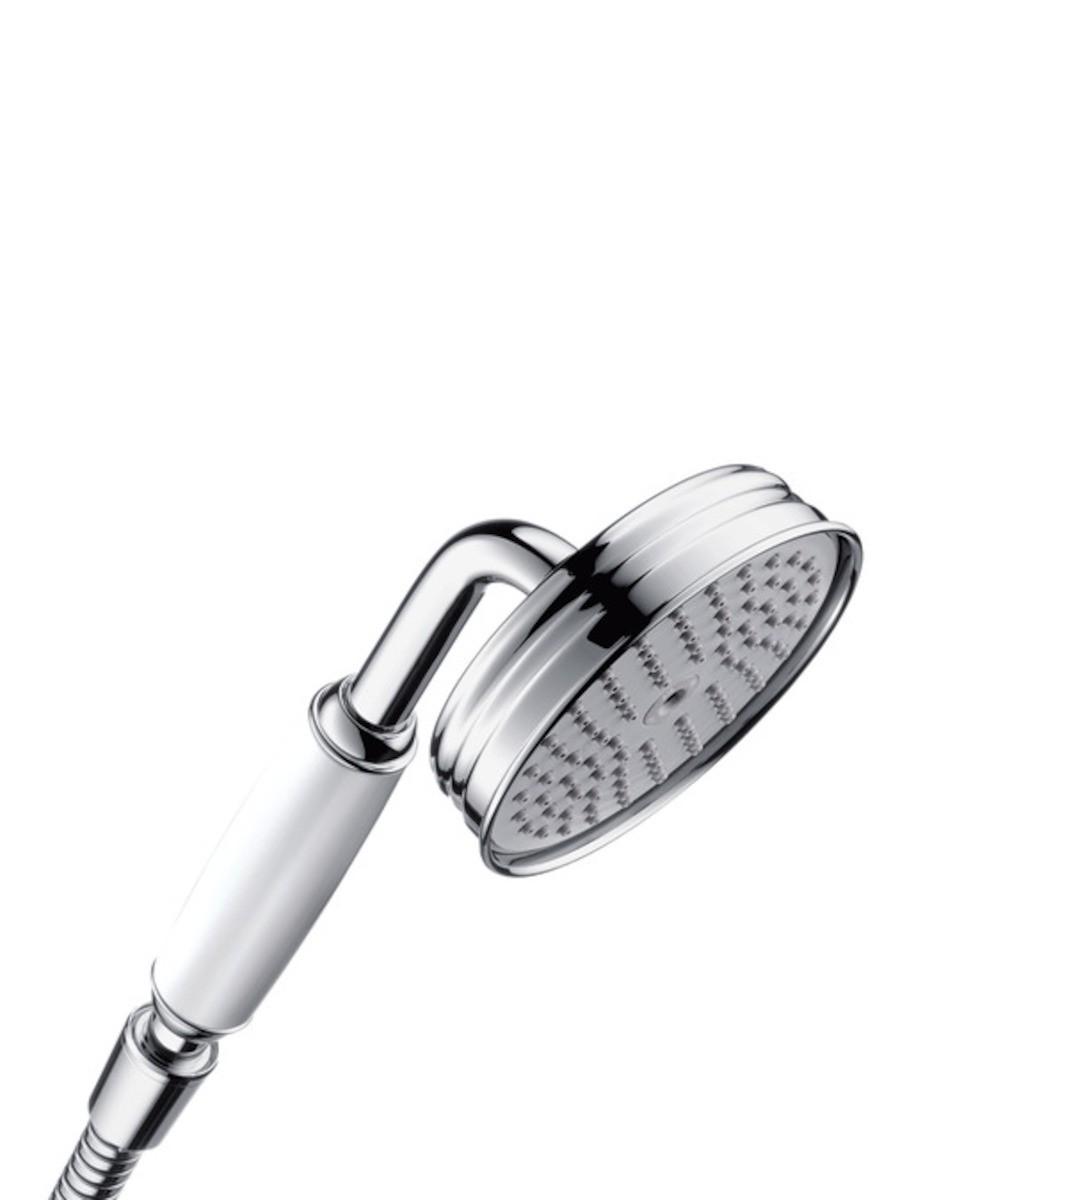 Ručná sprcha Hansgrohe Axor Montreux chróm 16320000